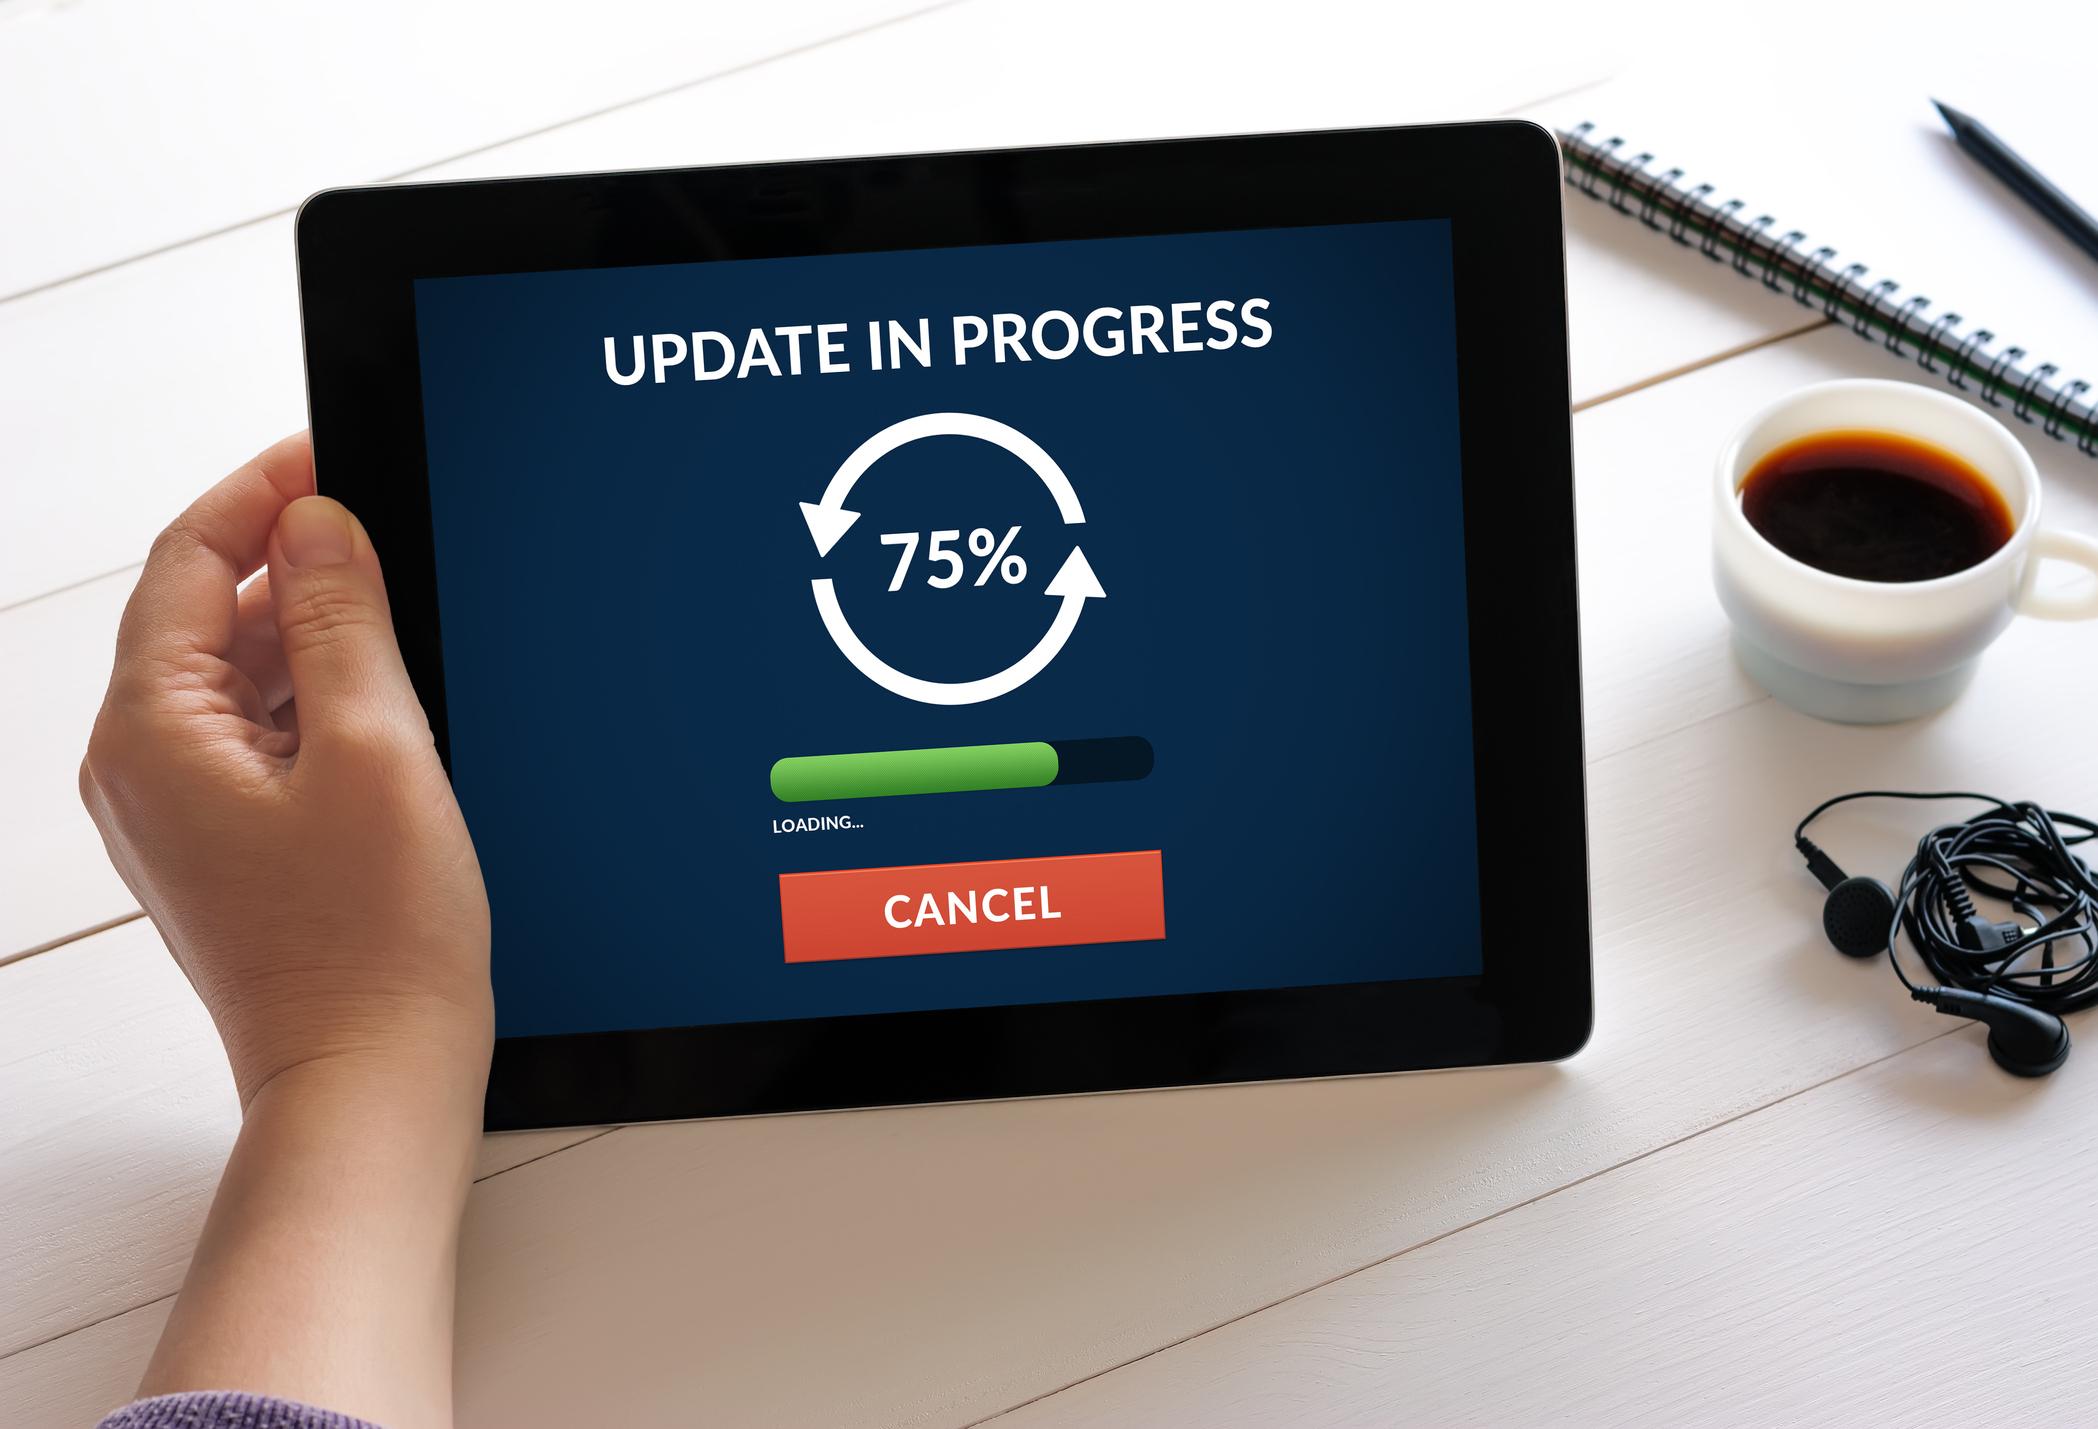 ad_myCLPNA_Update_in_ProgressV2